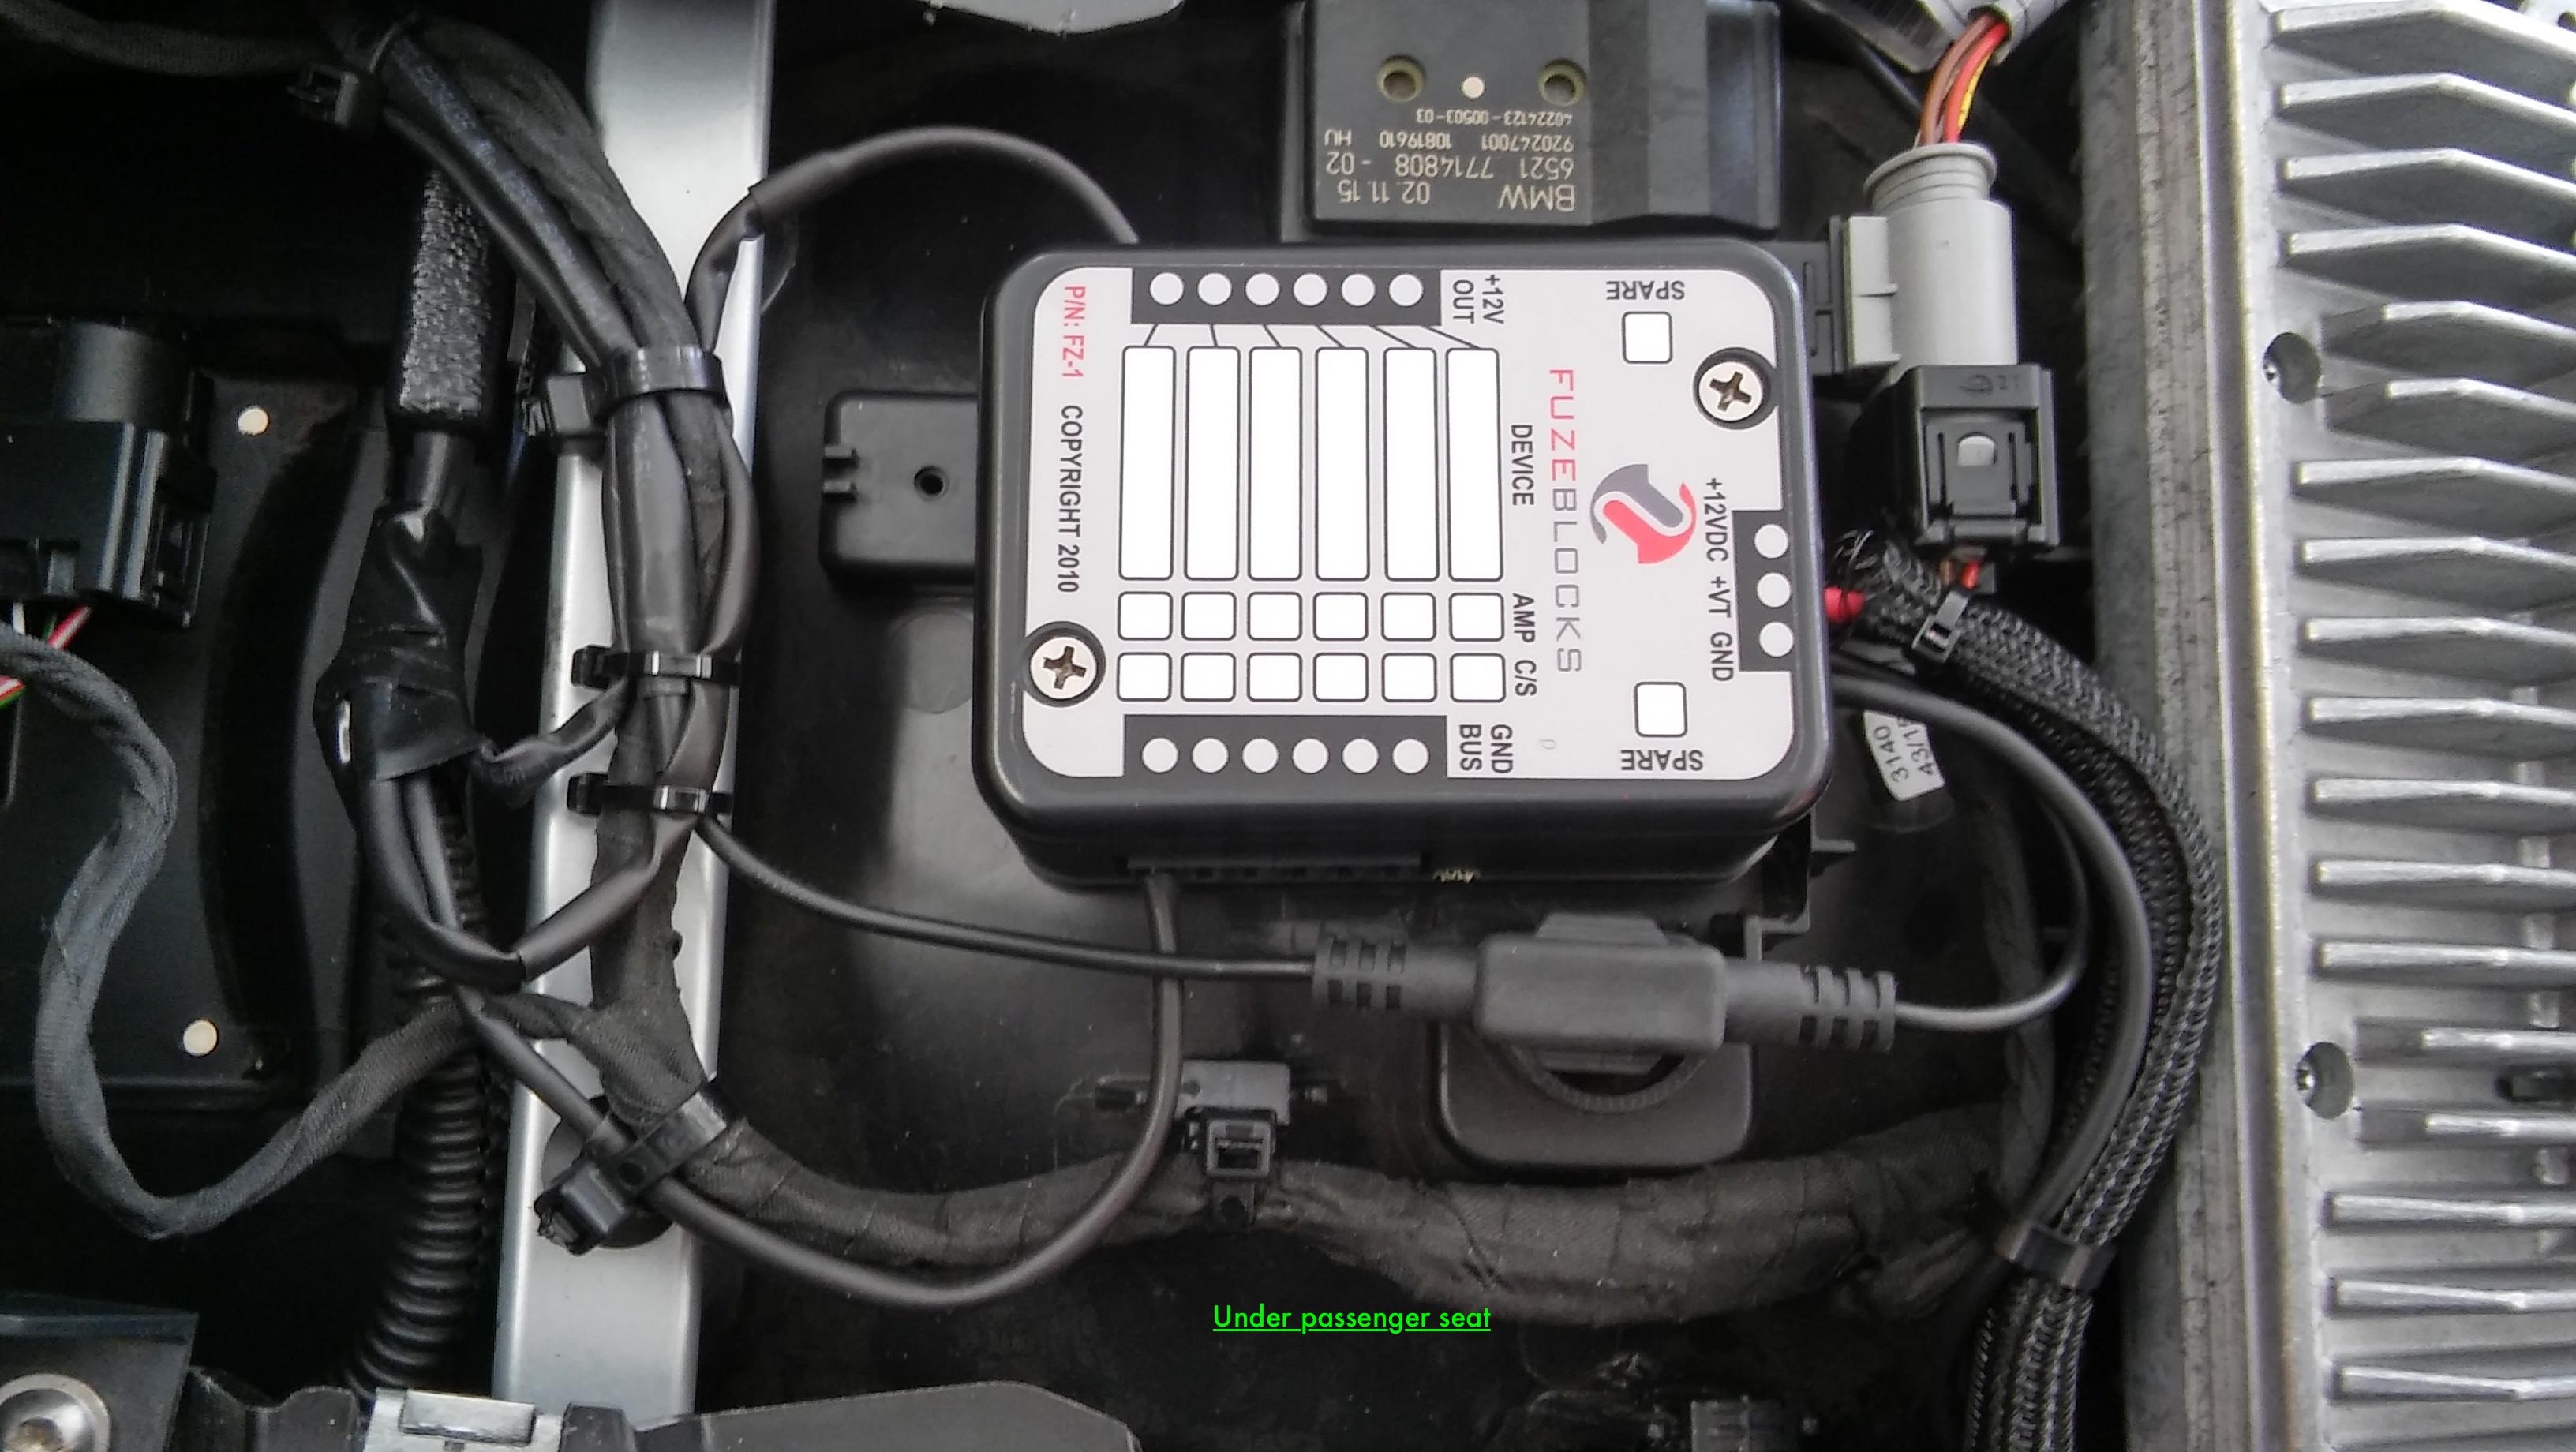 Fuse Box Bmw R1200gs Explained Wiring Diagrams Symbols Gs 1200 Location 01 Bwm 330ci 3 0 Locations